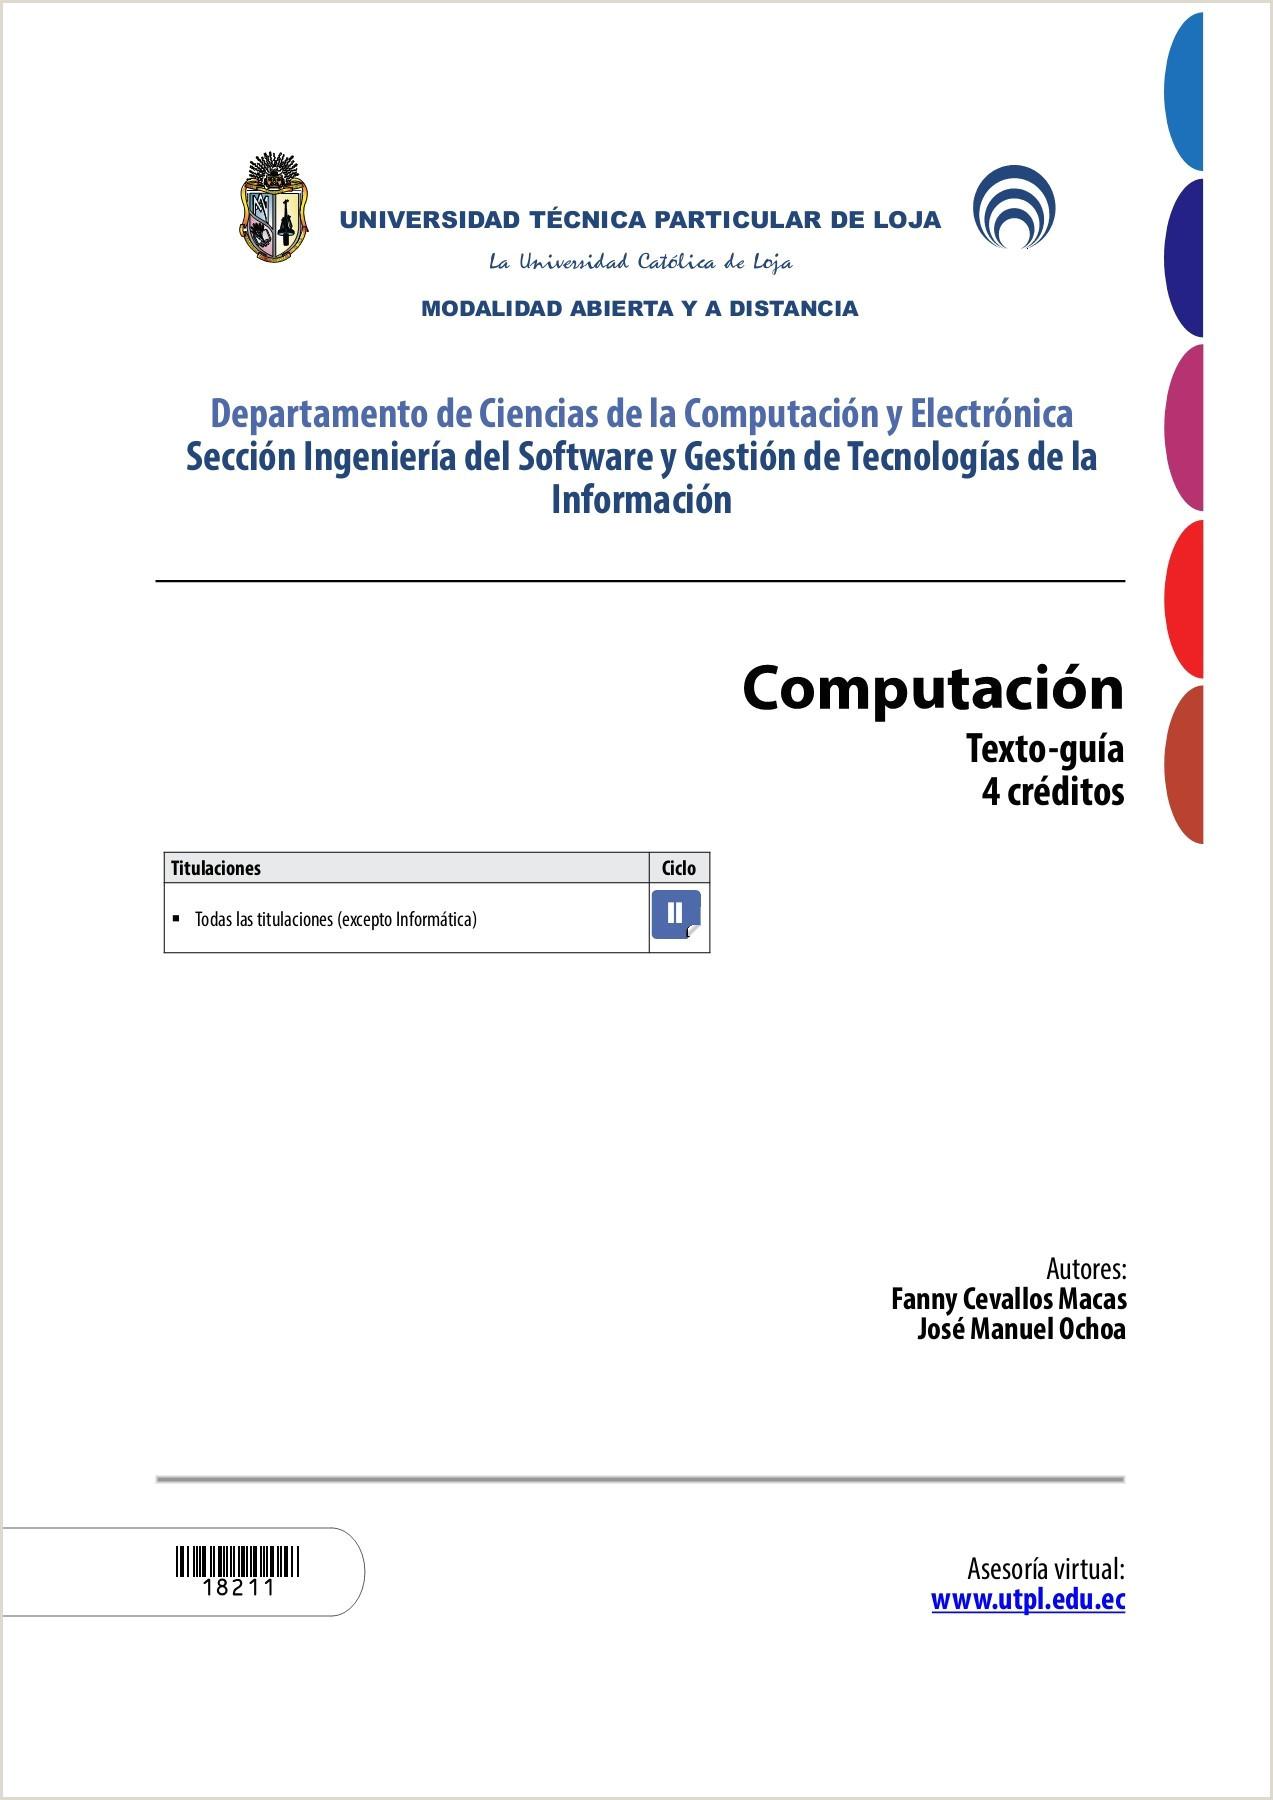 Hoja De Vida formato Unico Docx D Pages 1 50 Text Version